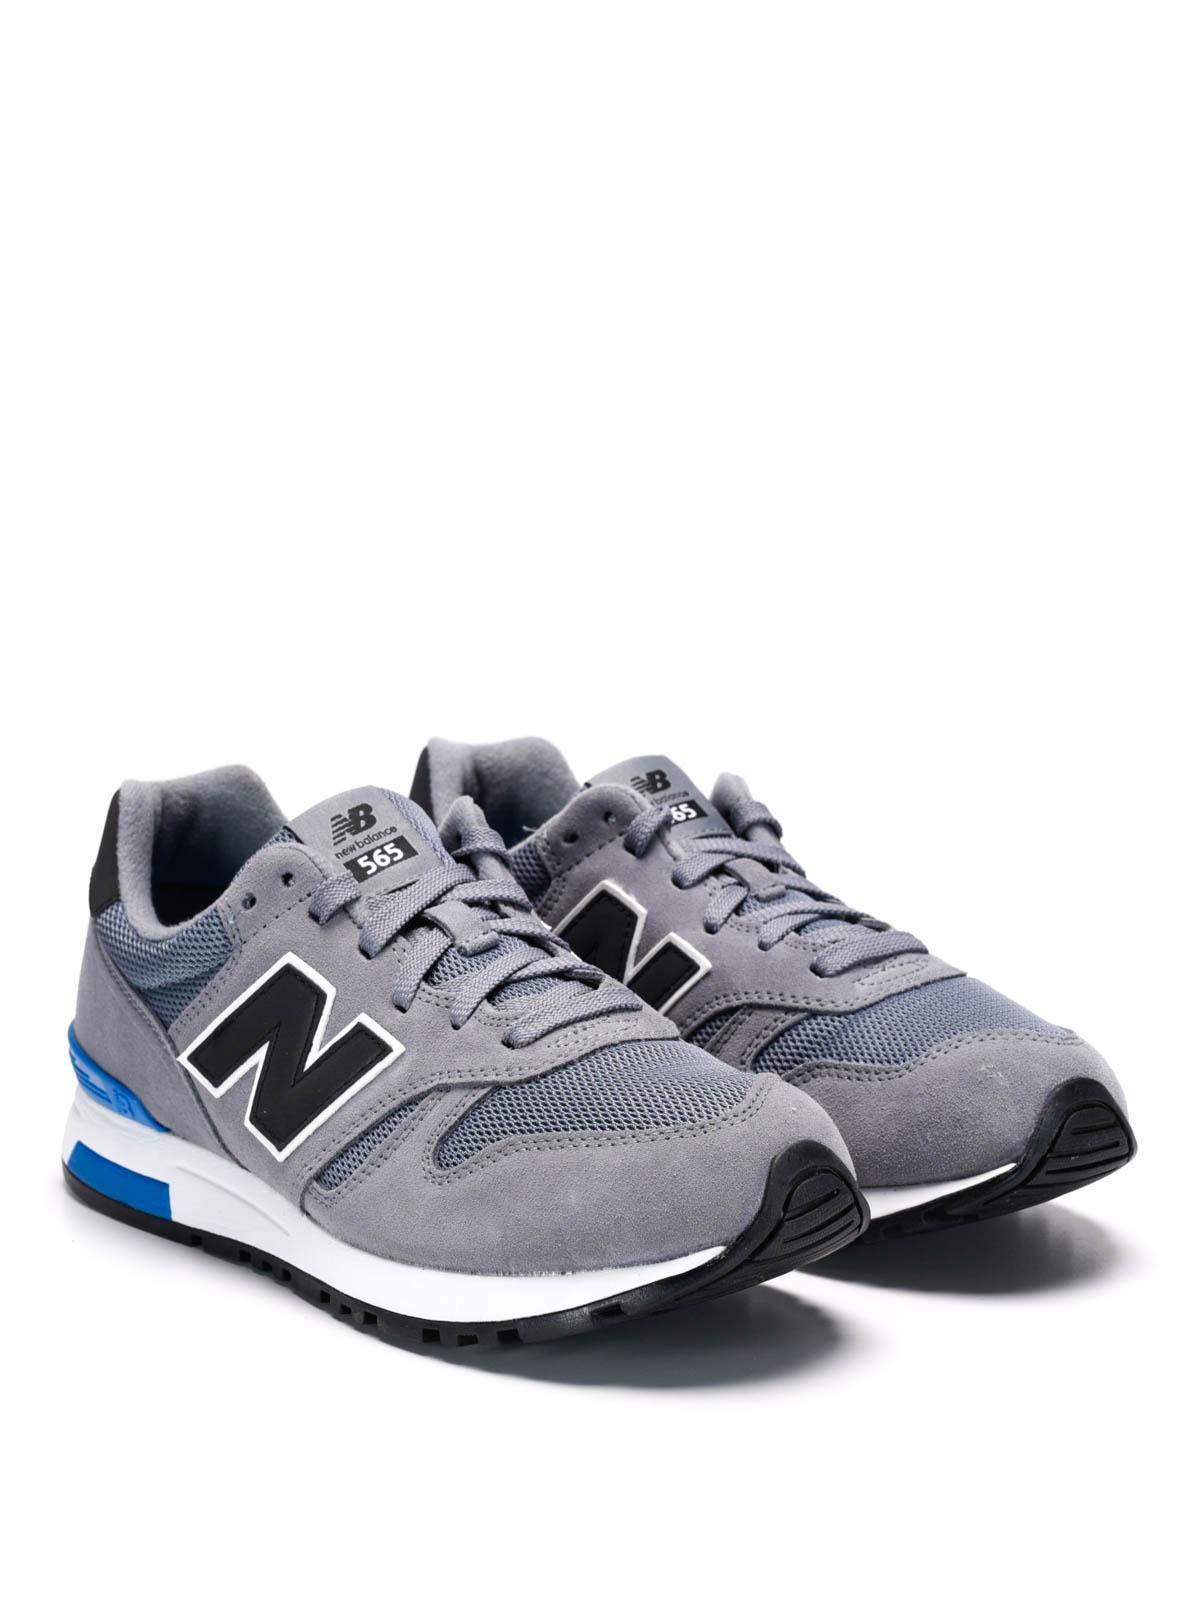 new balance 565 classic